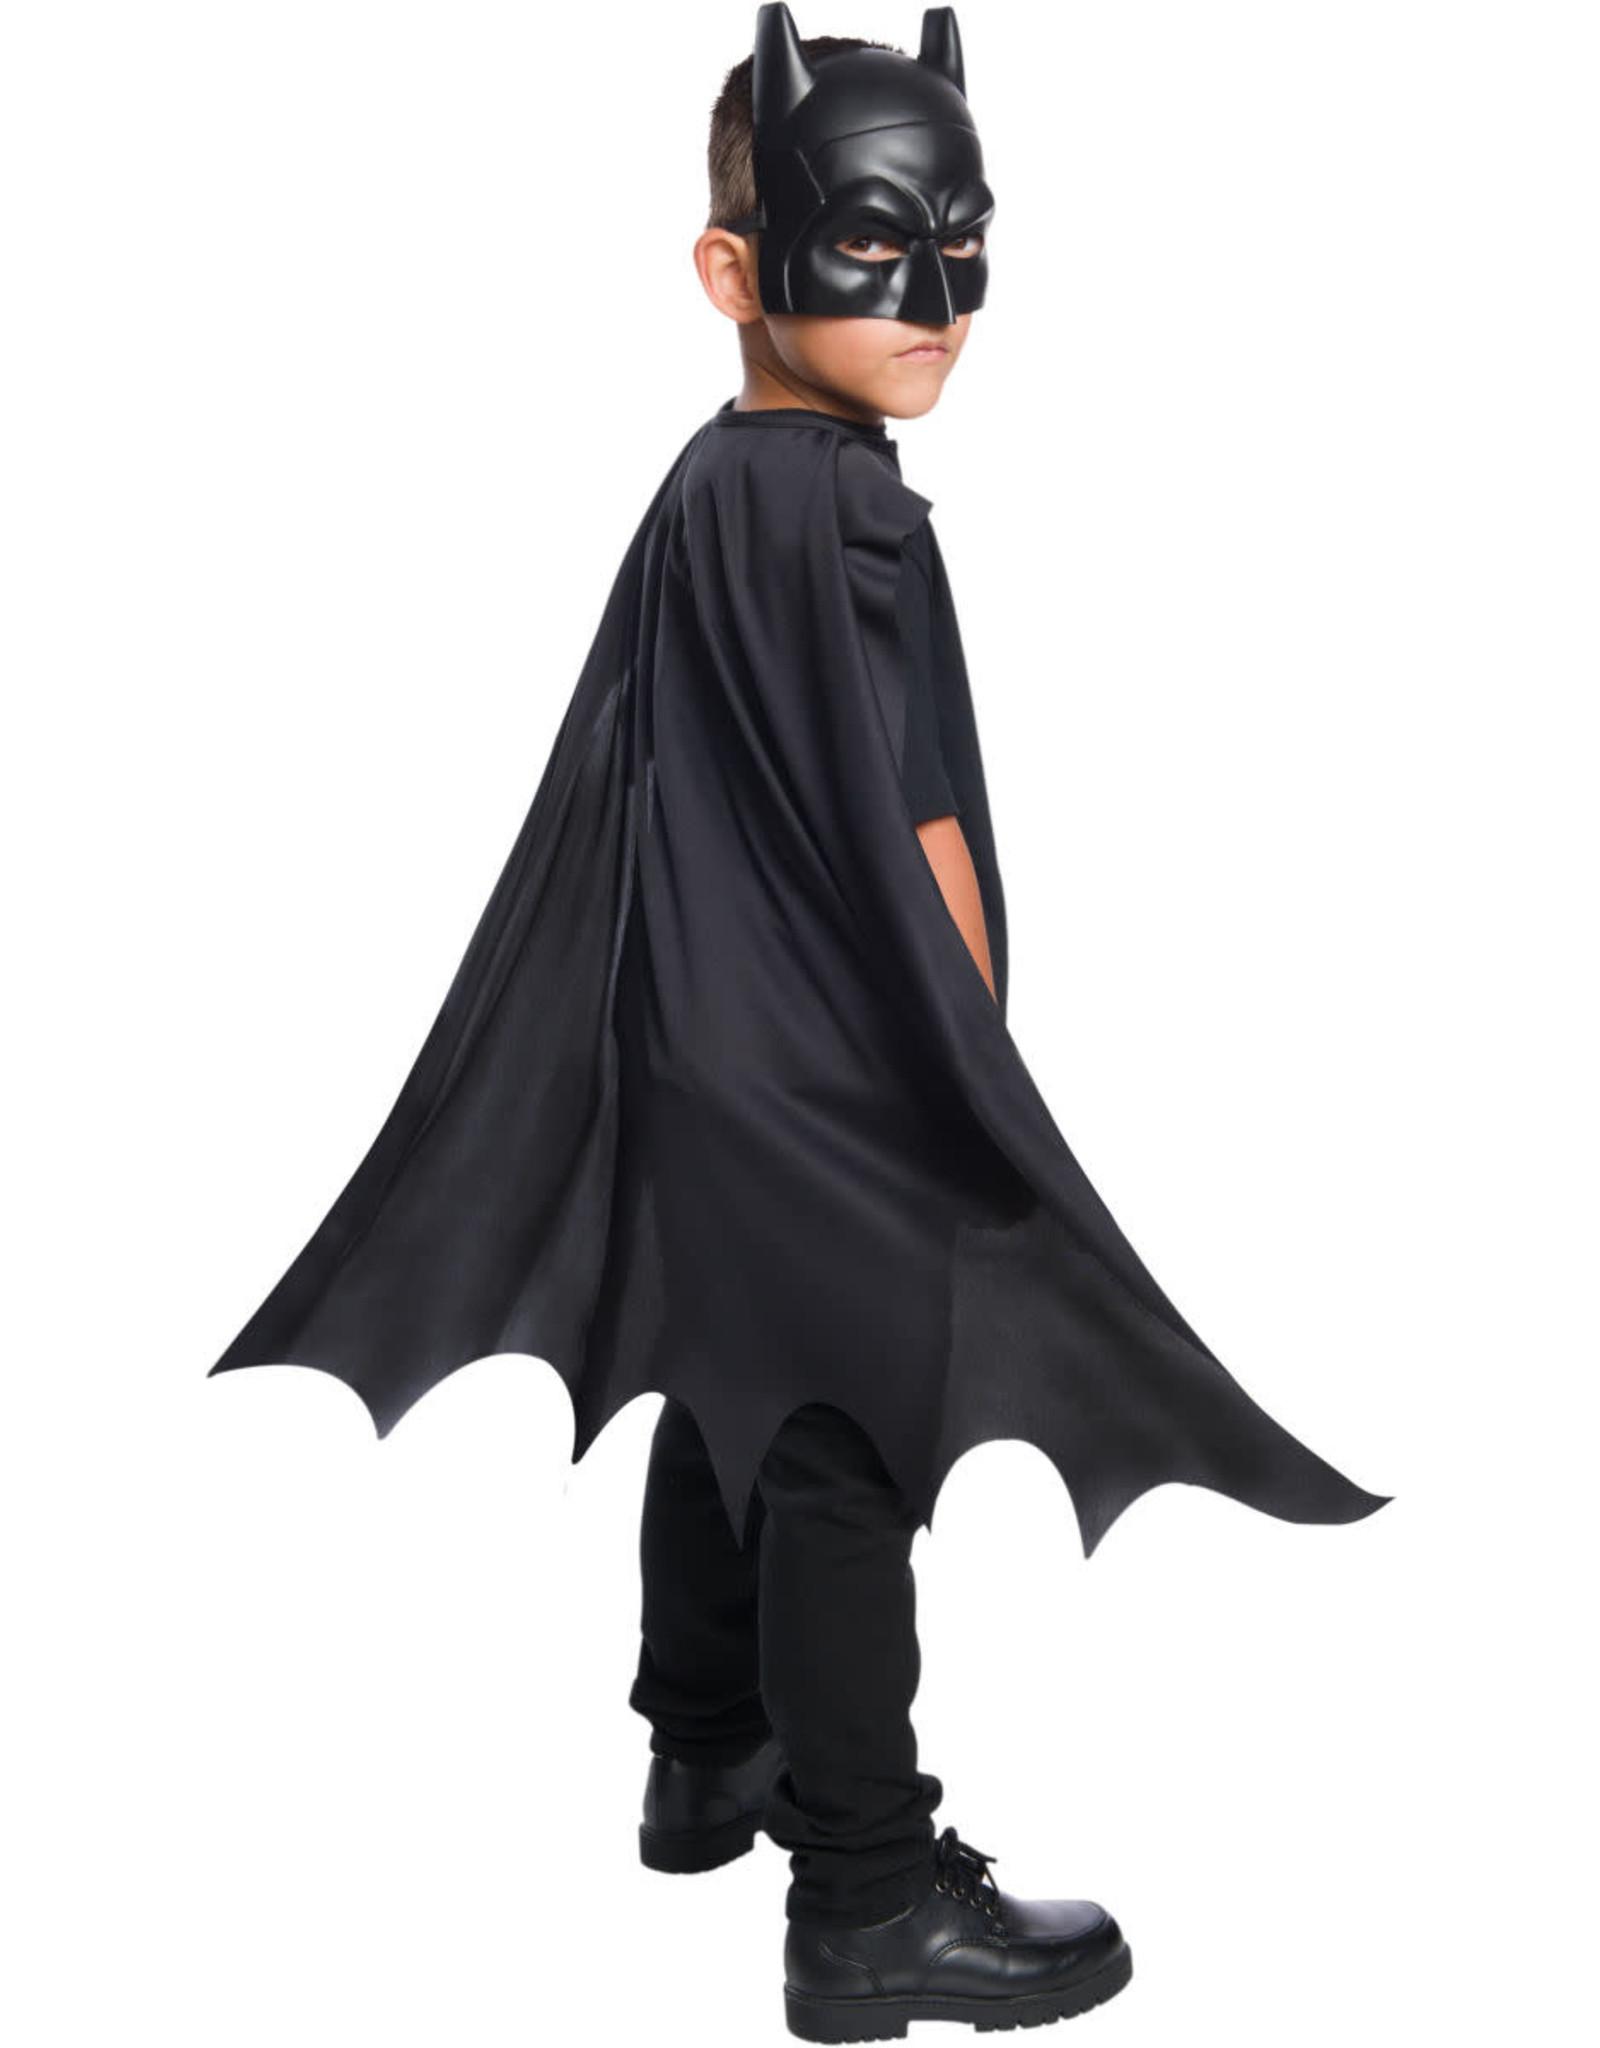 Rubies Costume Children's Batman Mask and Cape